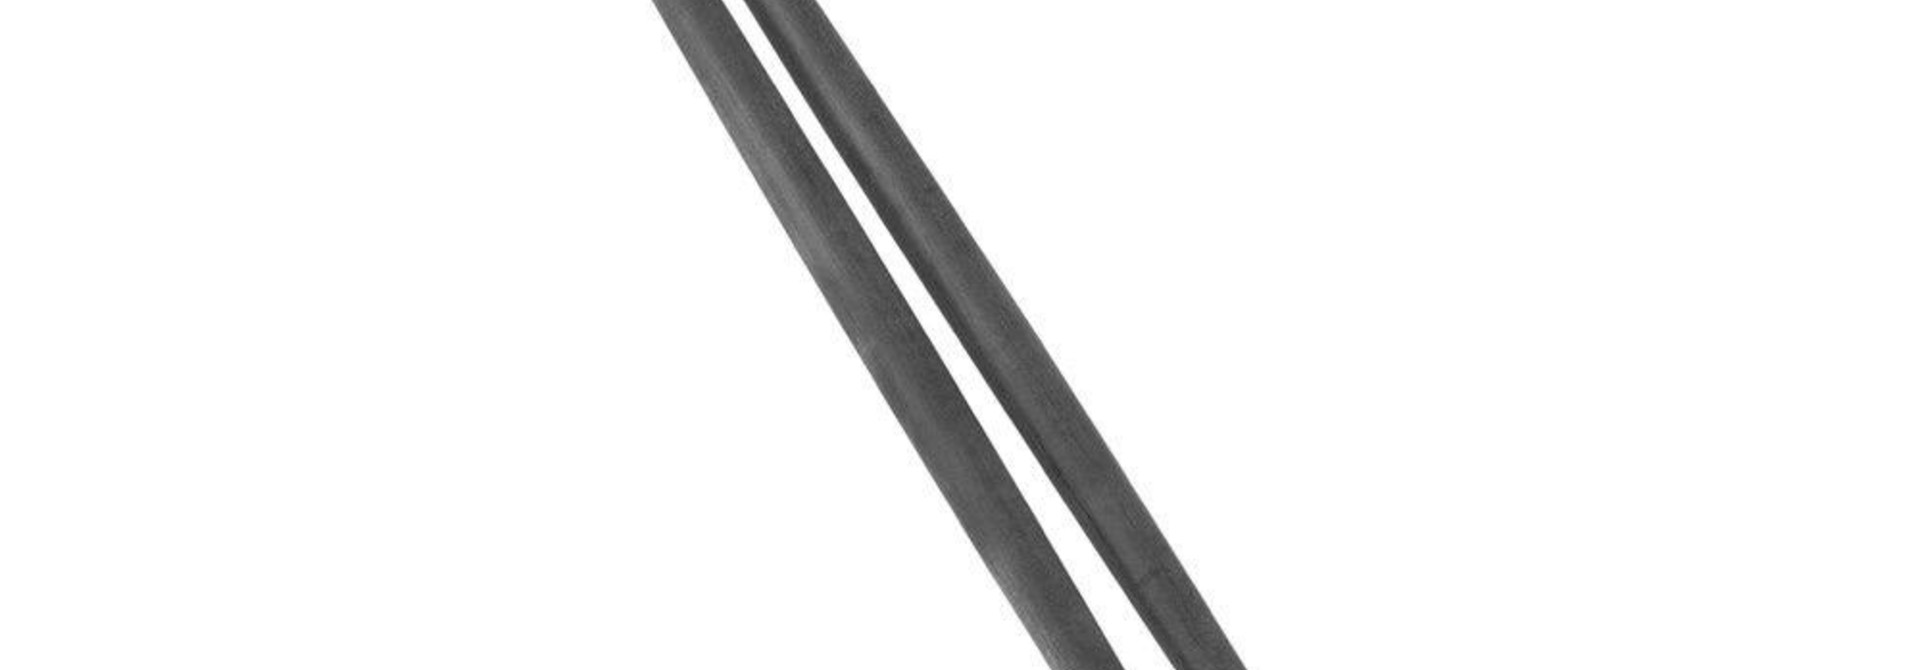 CUTIPOL - Goa Chopsticks 3 pcs Black / Stainless steel